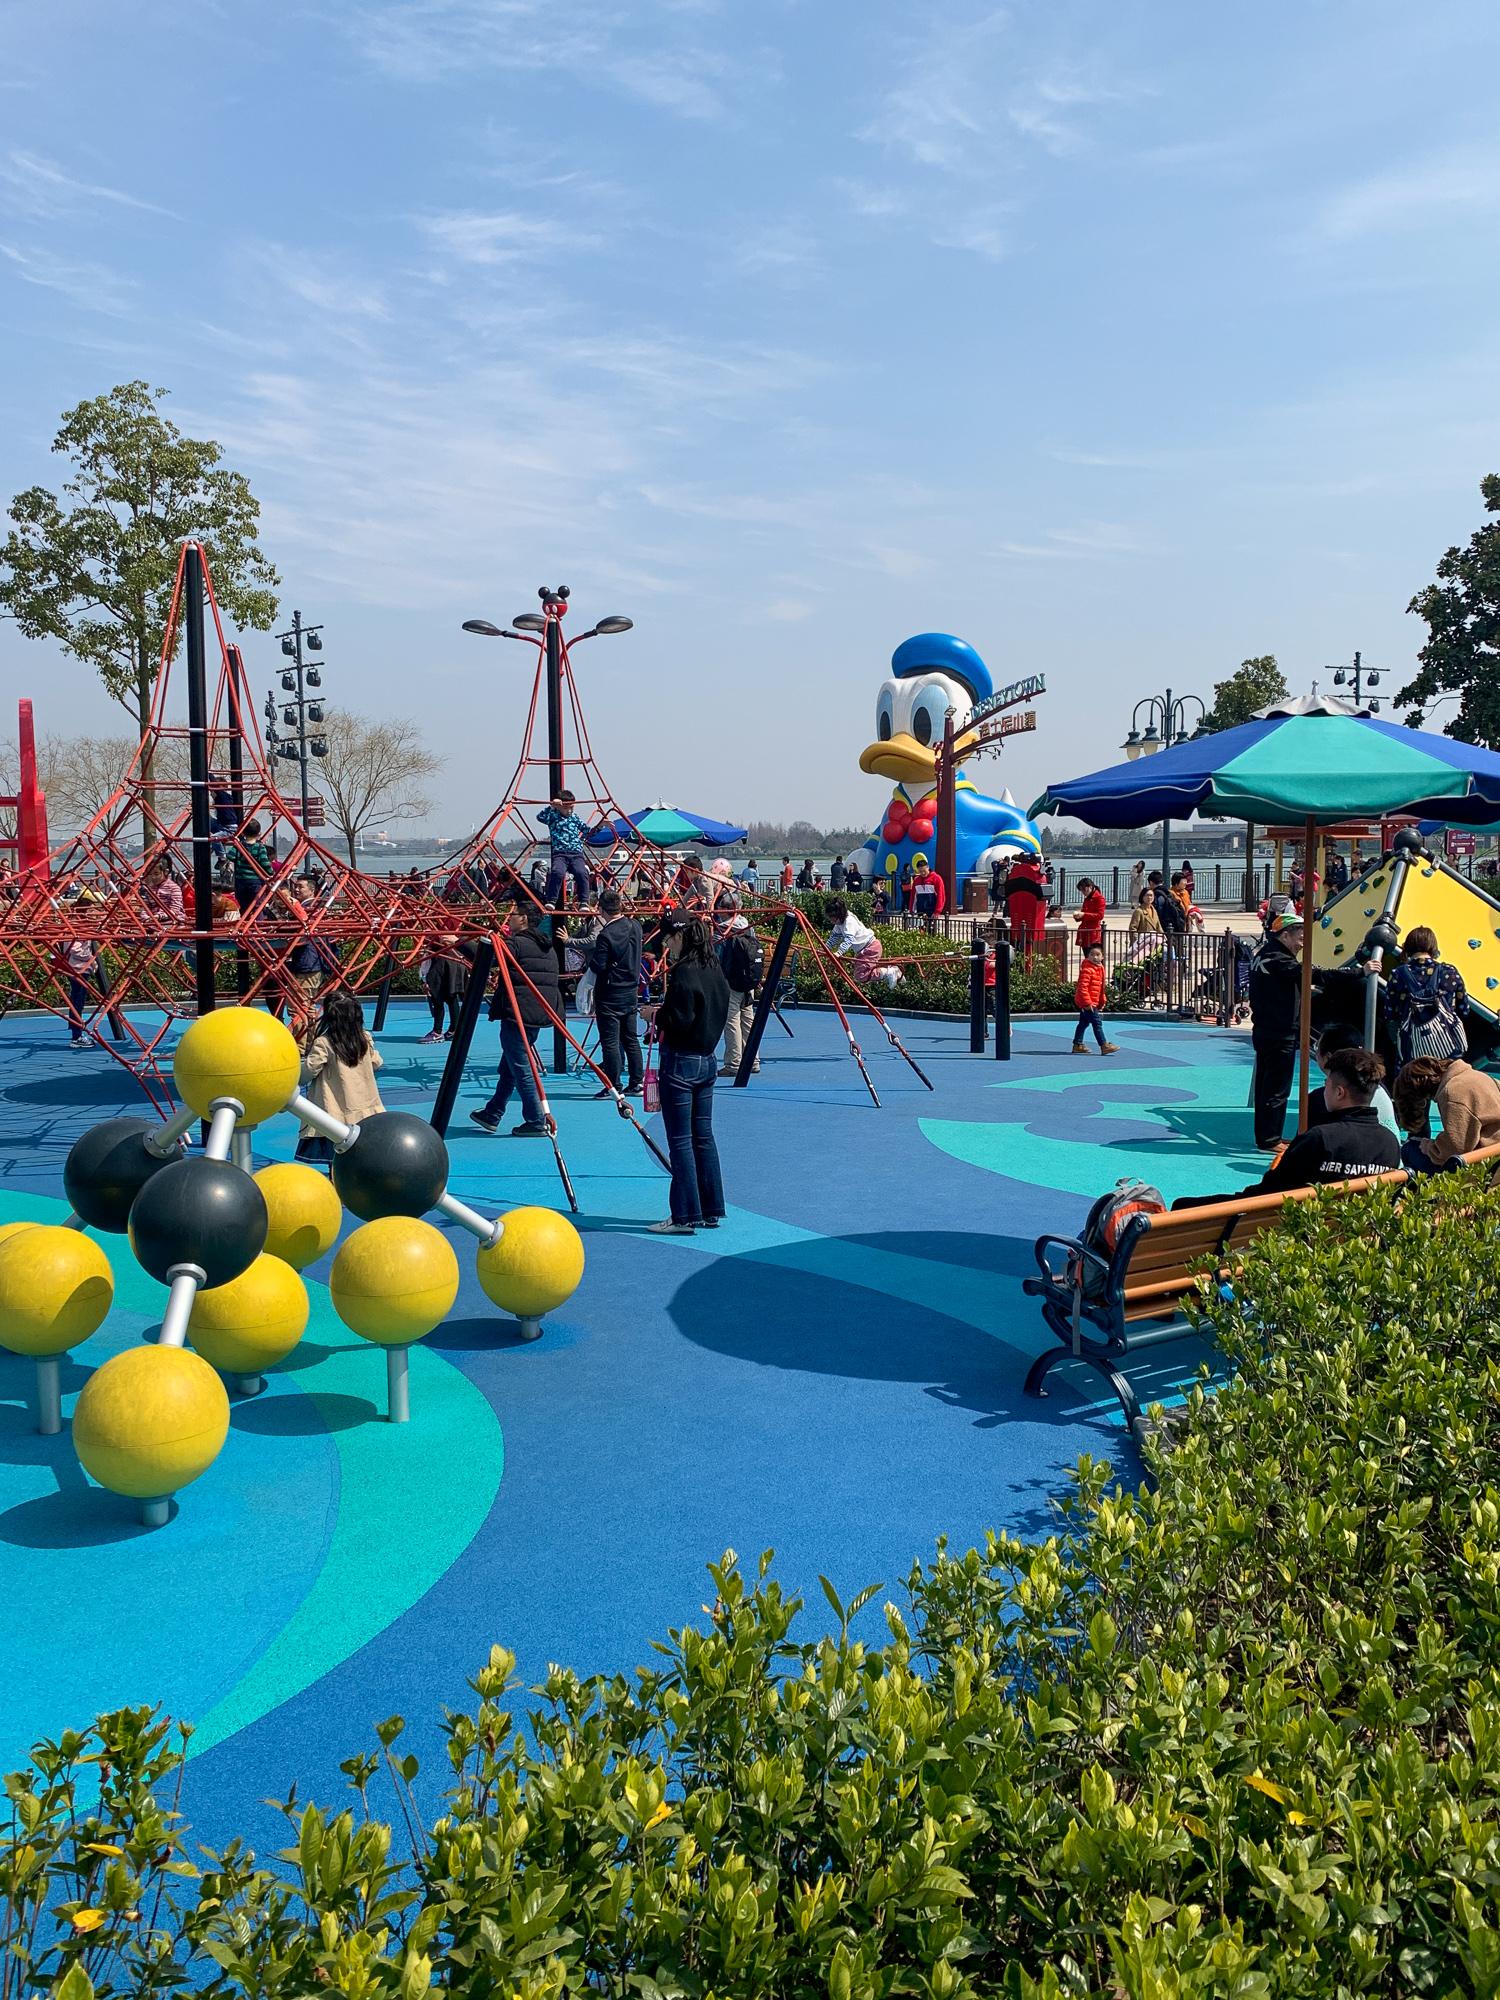 Dragonfly Playground in Disneytown